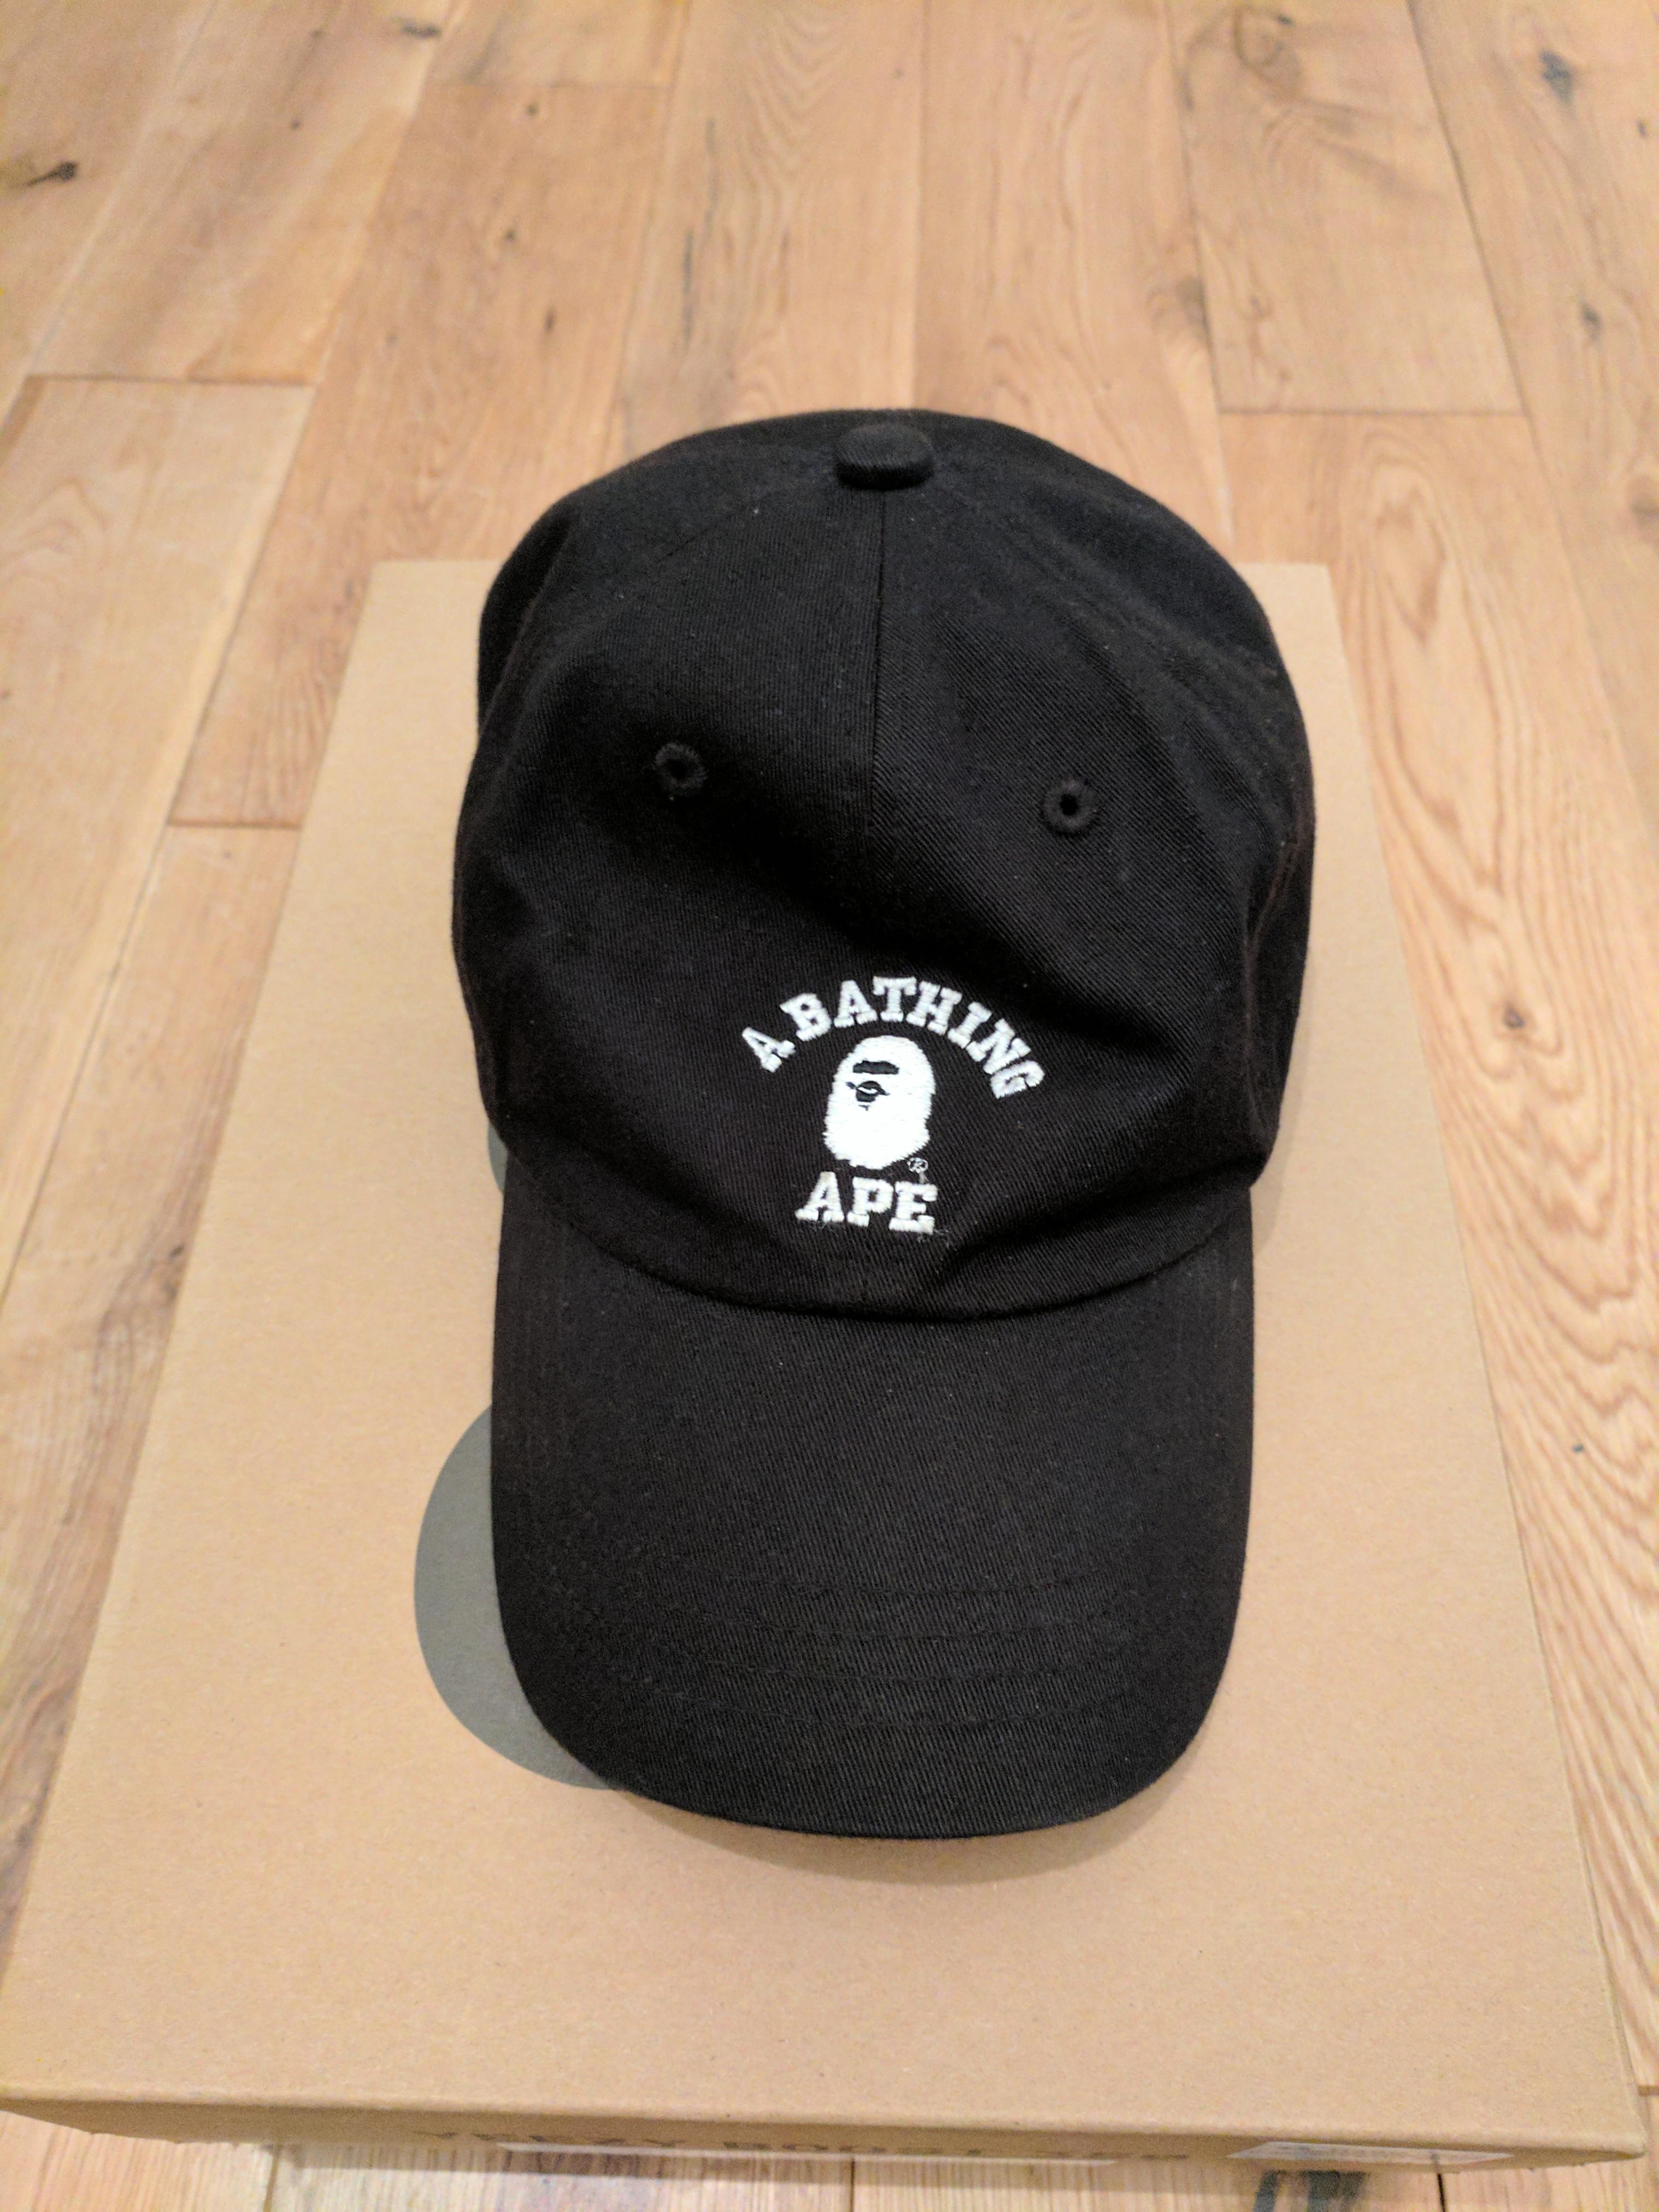 1a487775c12a0 Bape Bape College Cap Black OS Size one size - Hats for Sale - Grailed